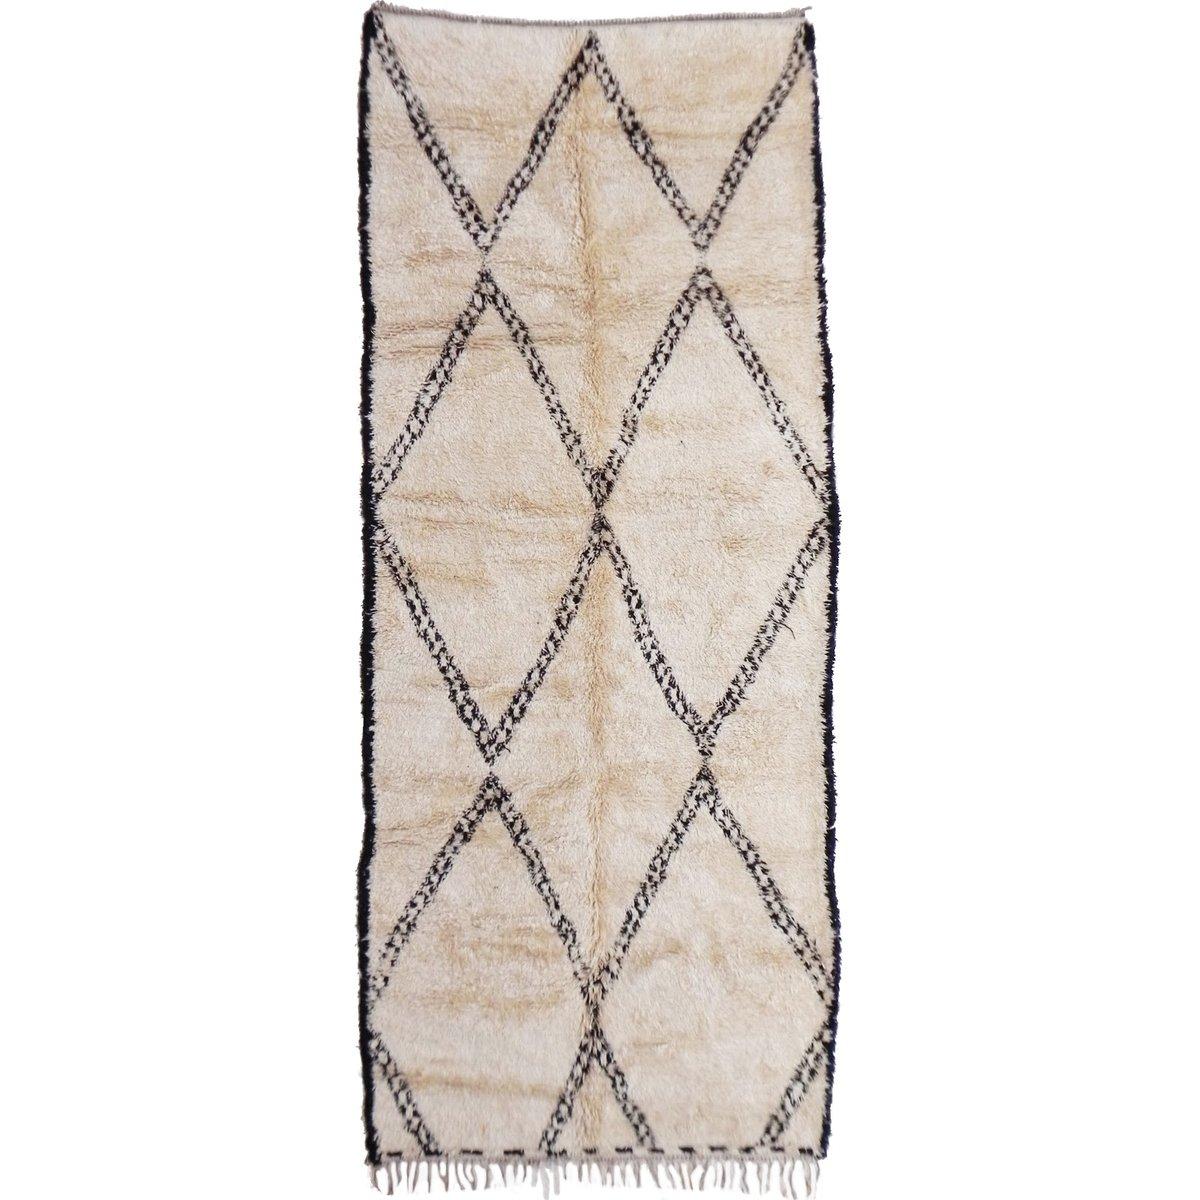 14397 beni ouarain berber vintage palace rug for sale at pamono. Black Bedroom Furniture Sets. Home Design Ideas